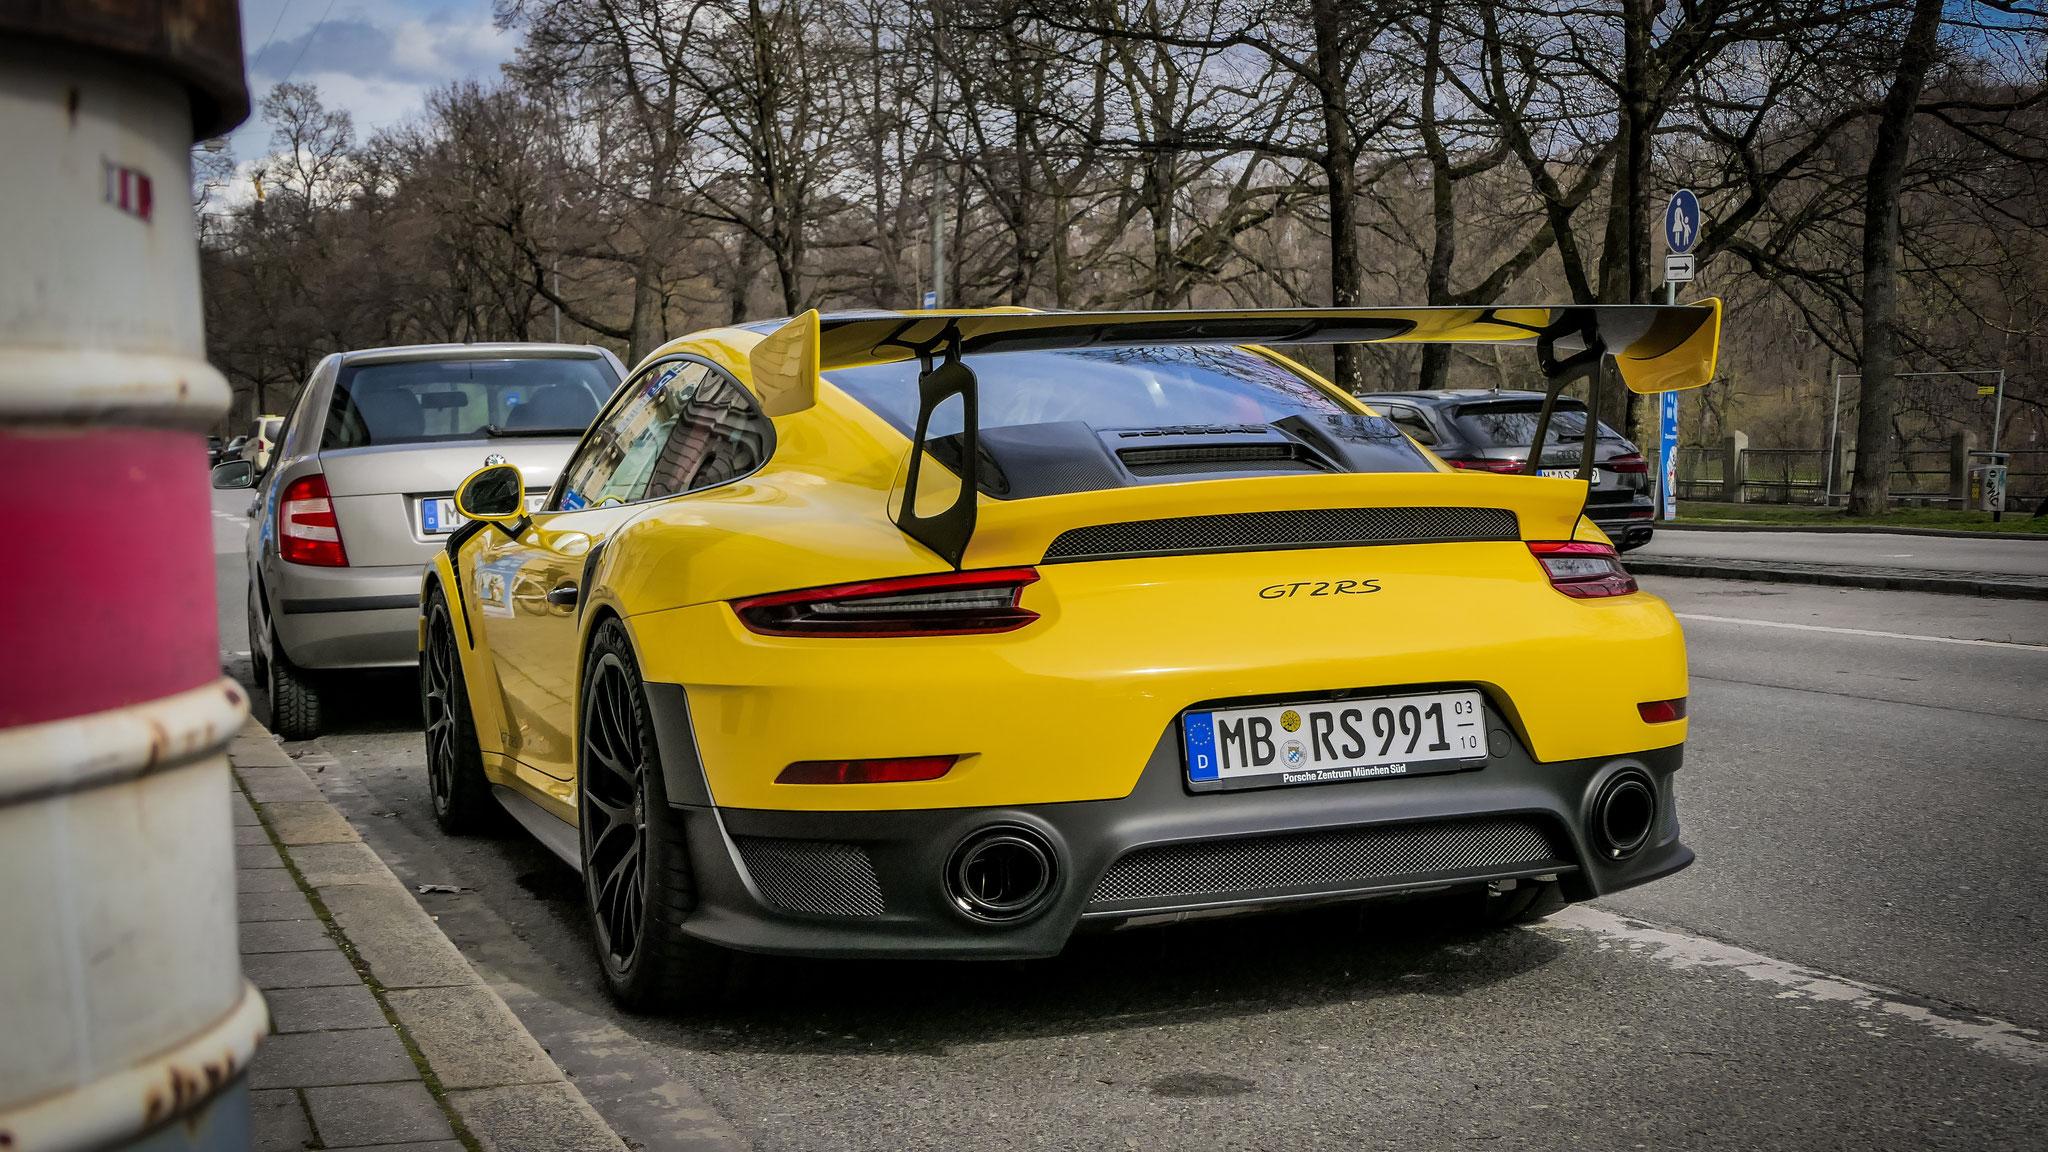 Porsche GT2 RS - MB-RS-991